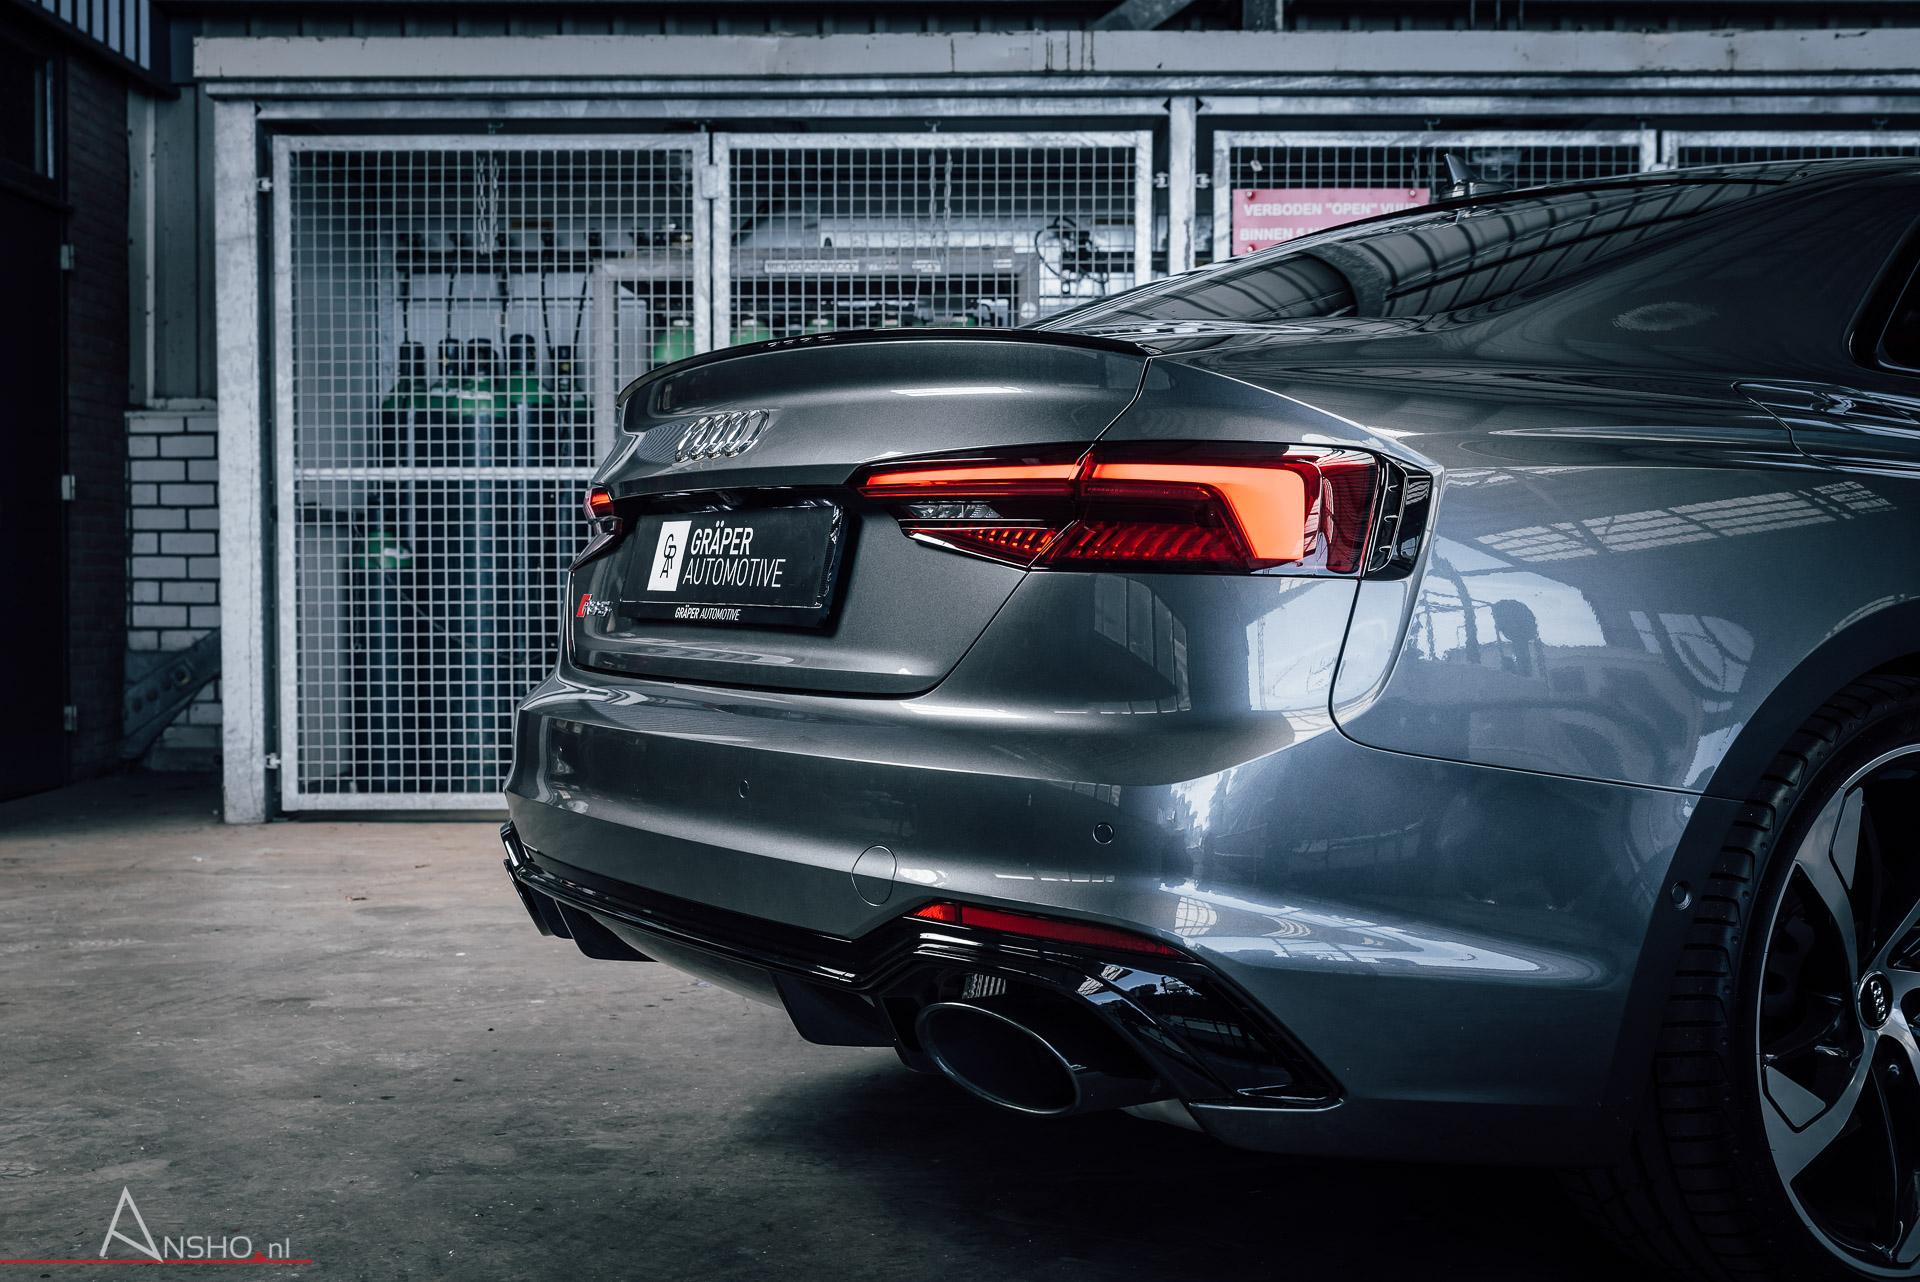 2017 Audi RS5 | Hartvoorautos.nl